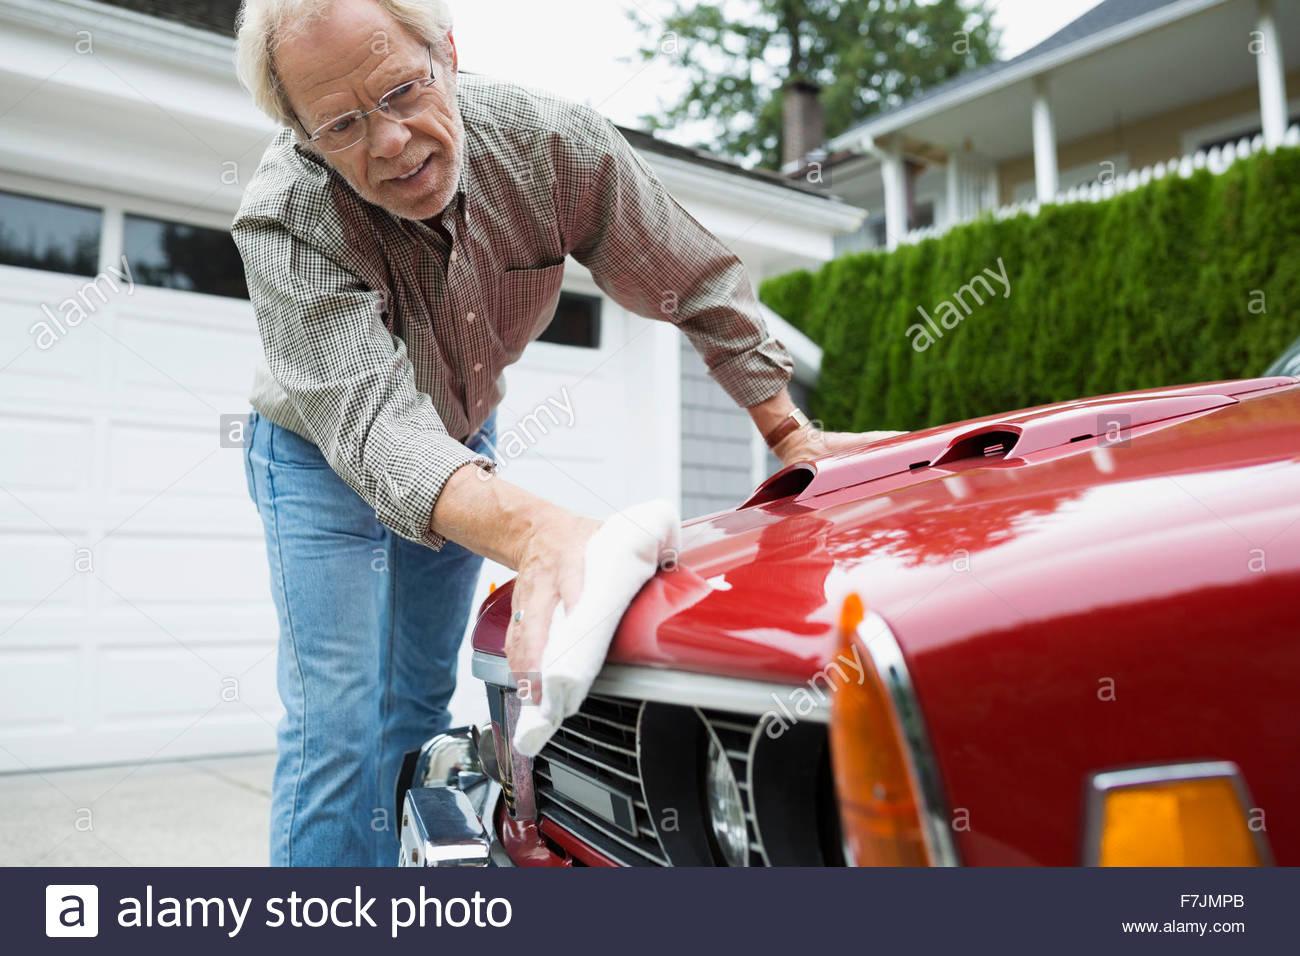 Ältere Mann wachsen Oldtimer in Einfahrt Stockbild